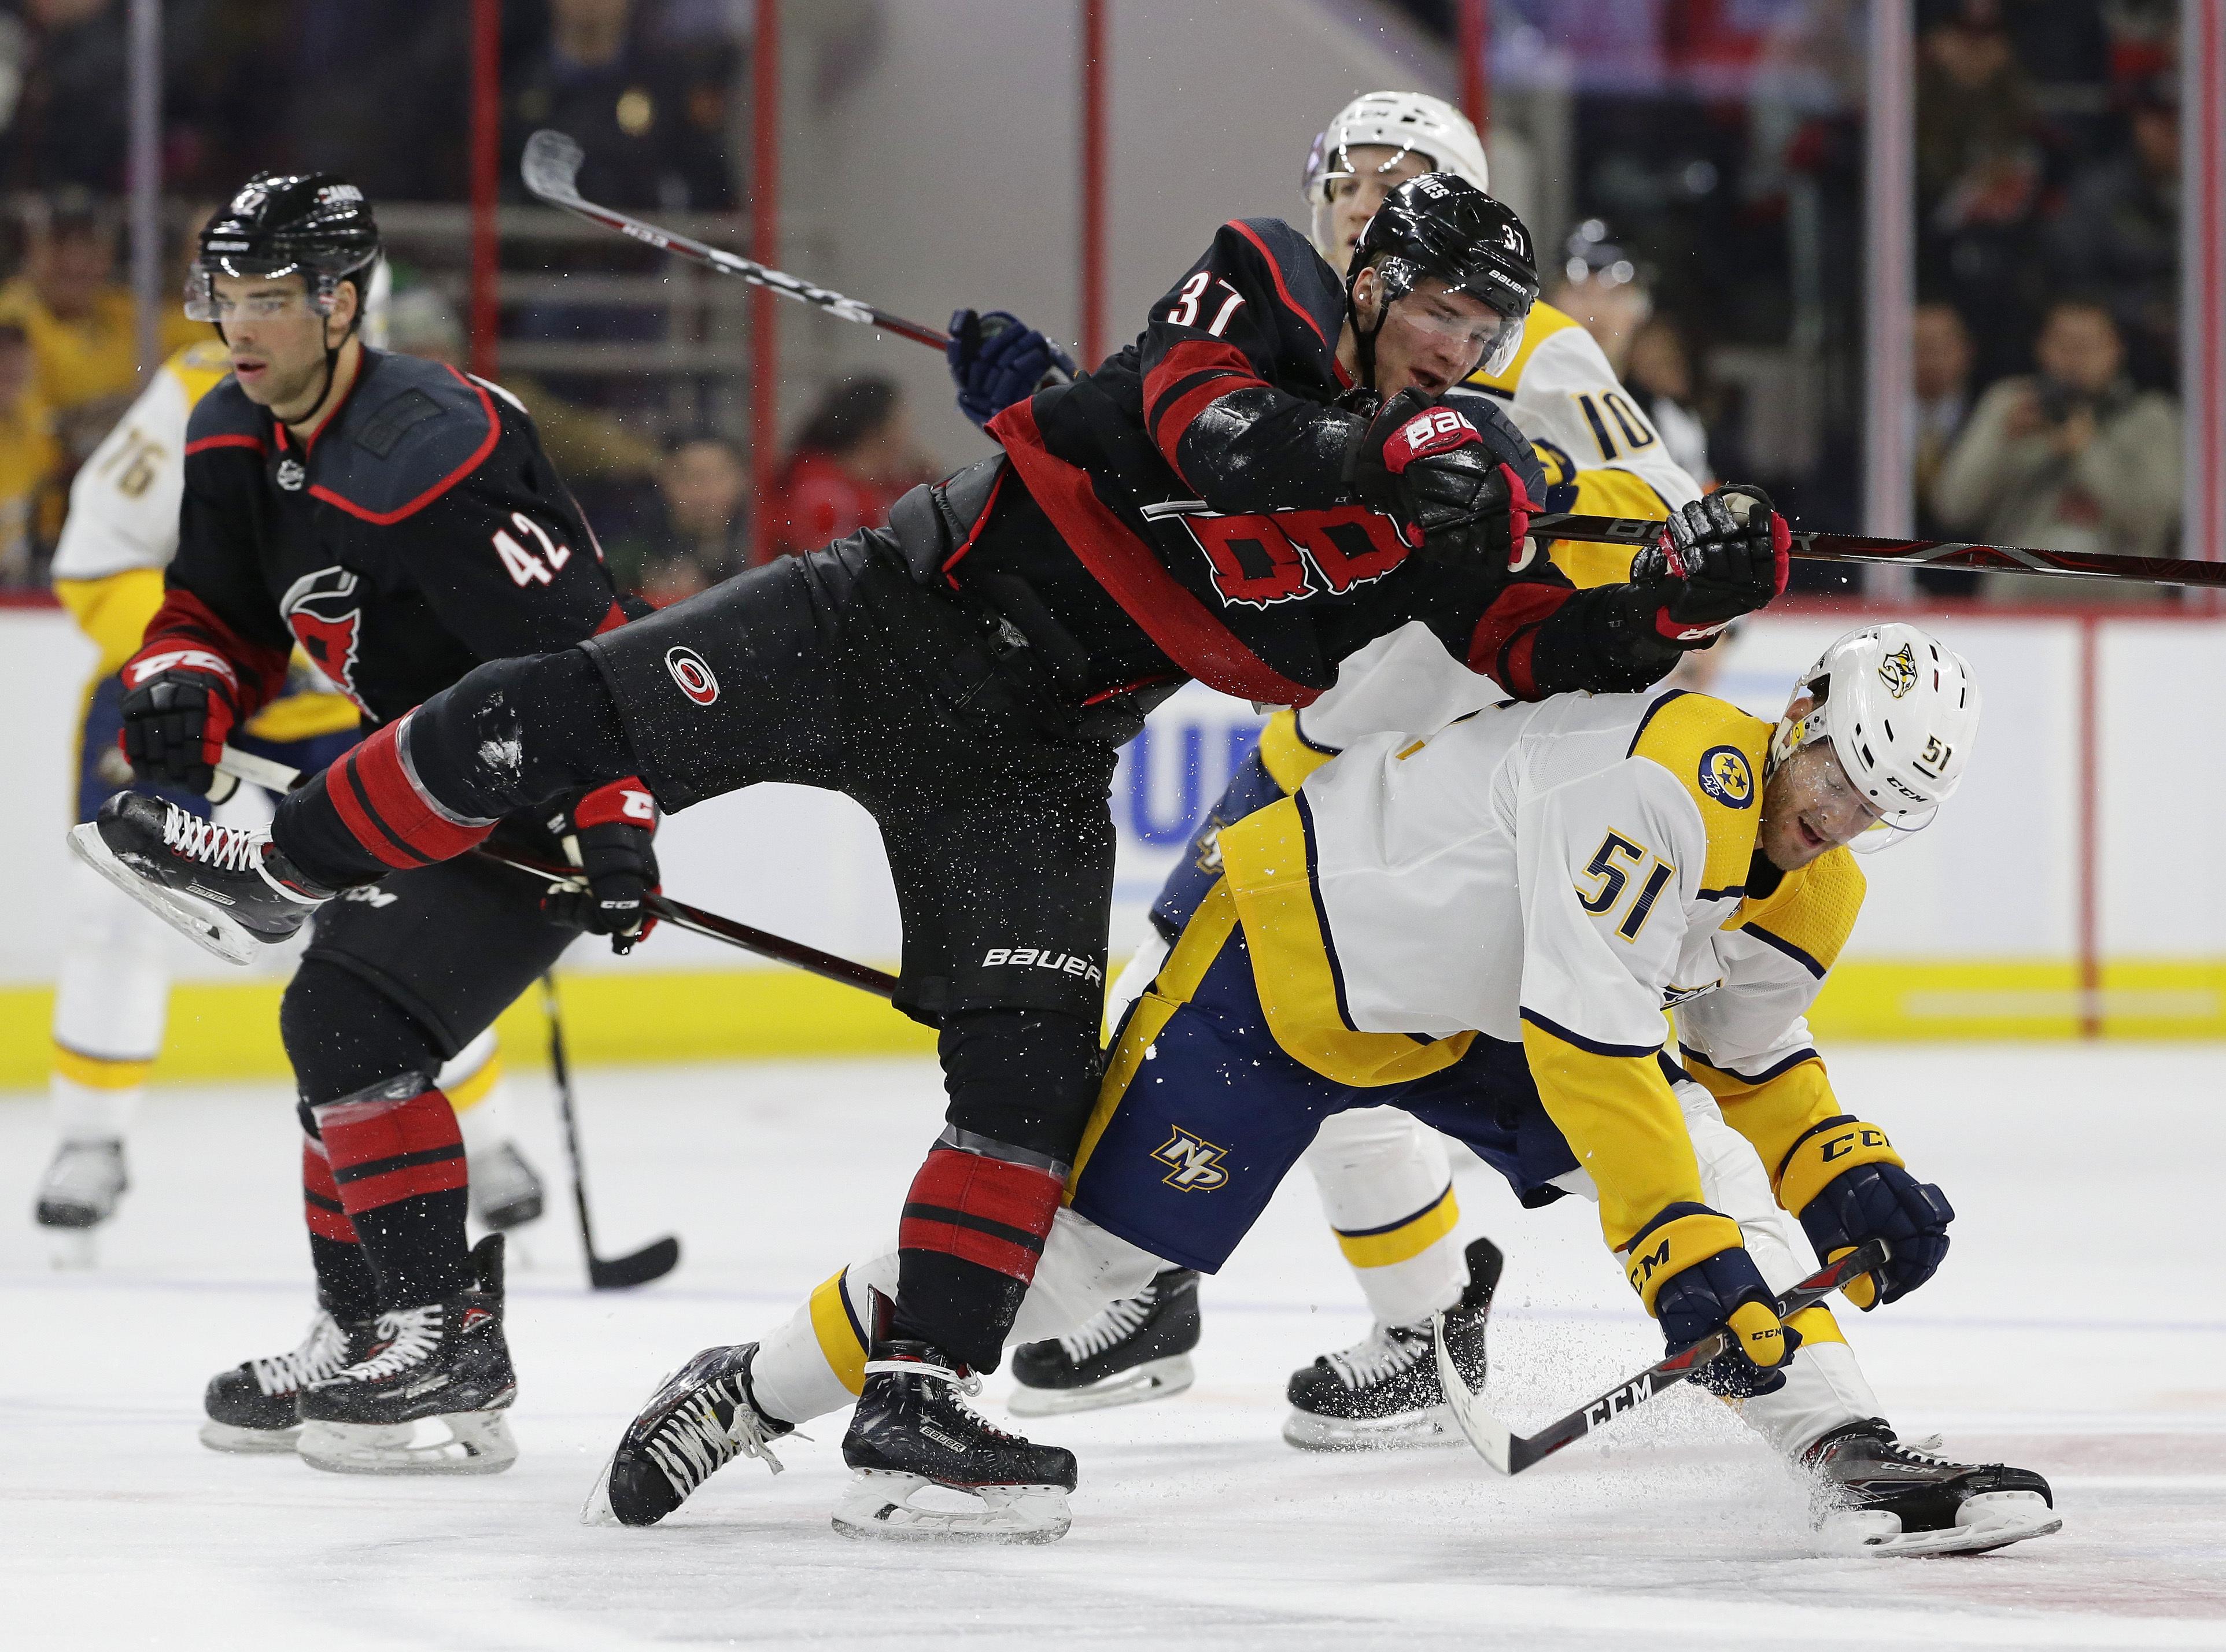 Aho leads Hurricanes past Predators 6-3